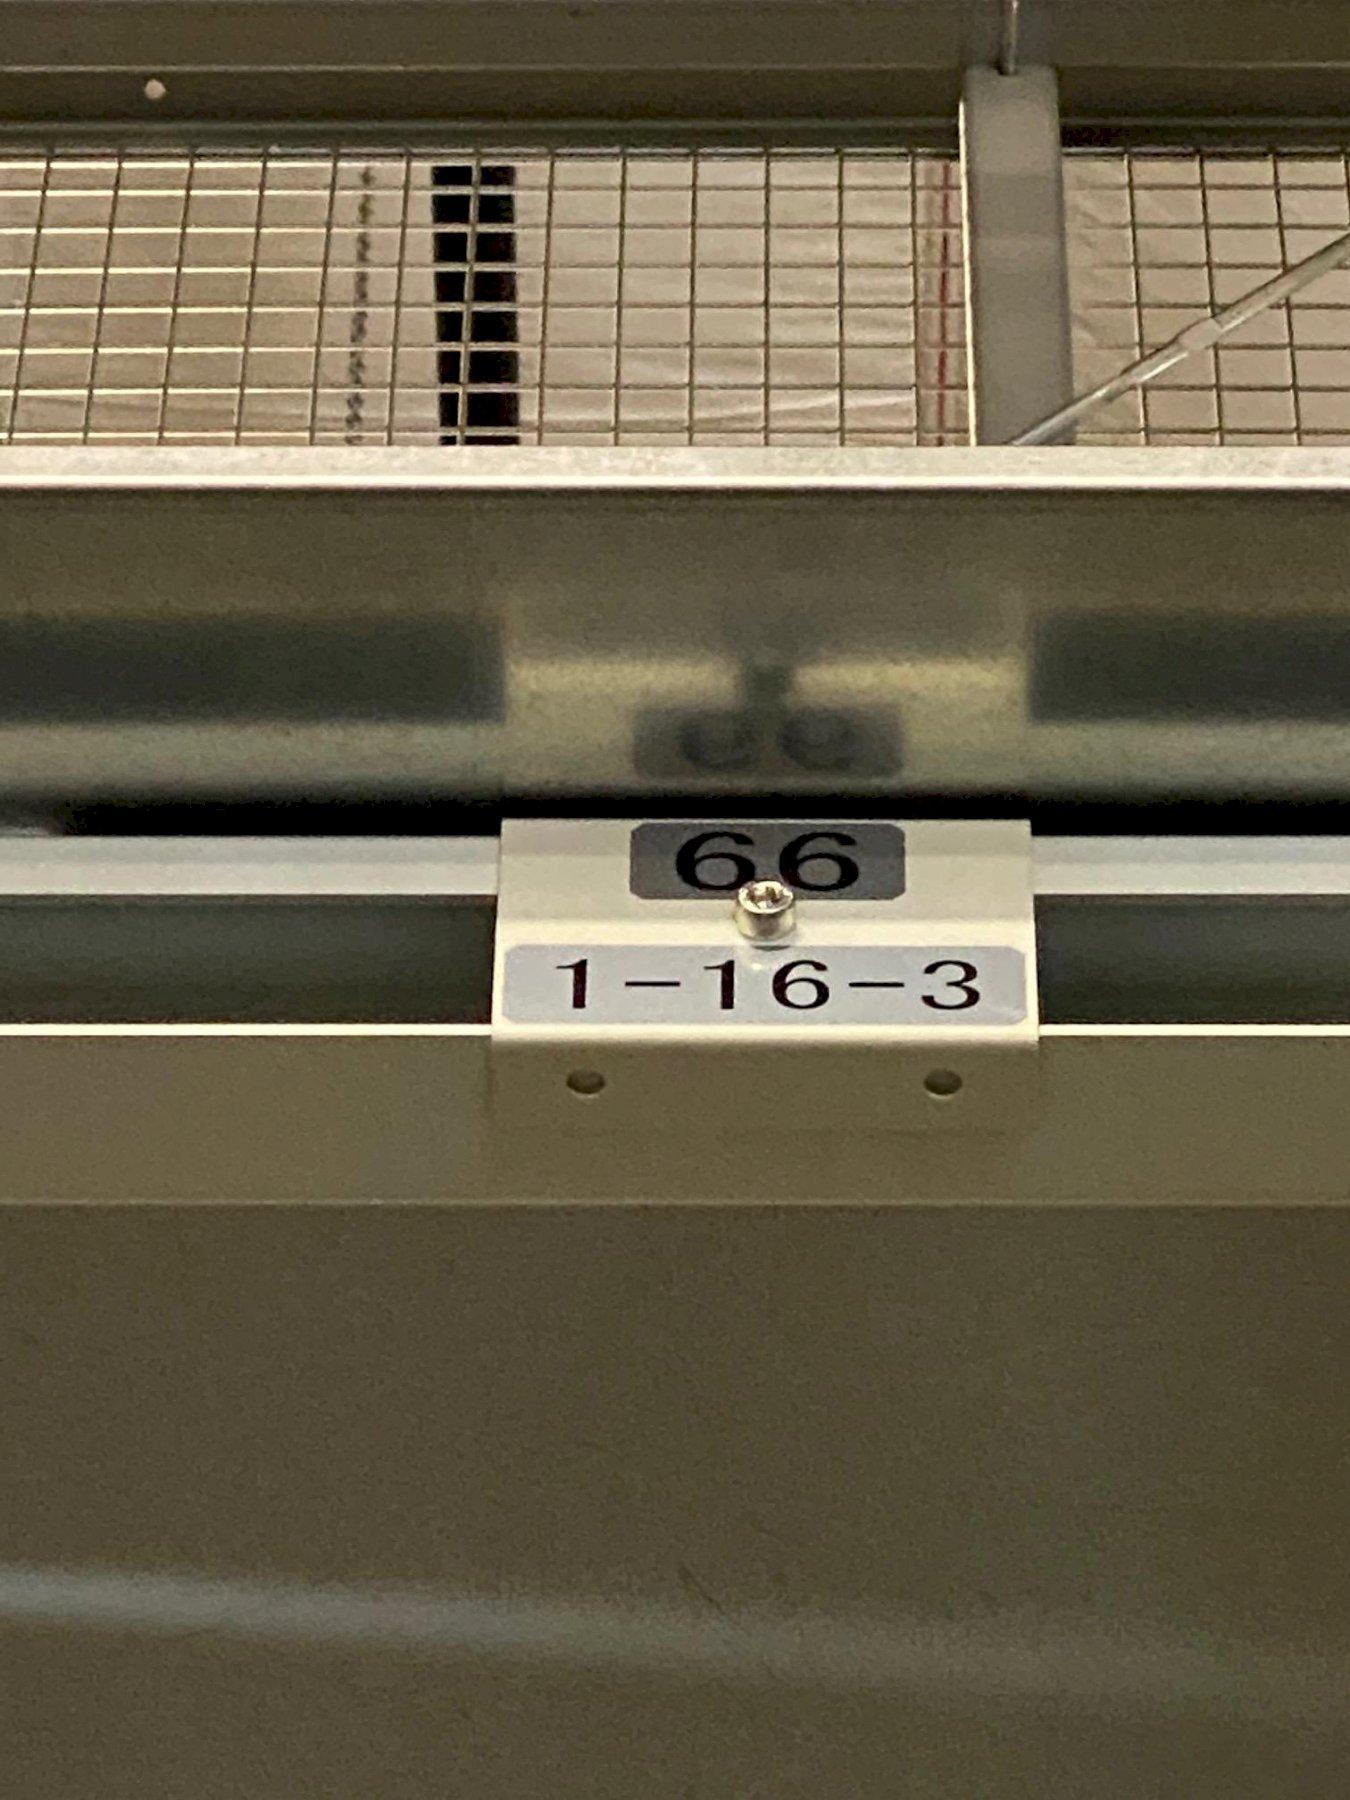 Makino a51nx Horizontal Machining Center with 66 Station Makino MMC2